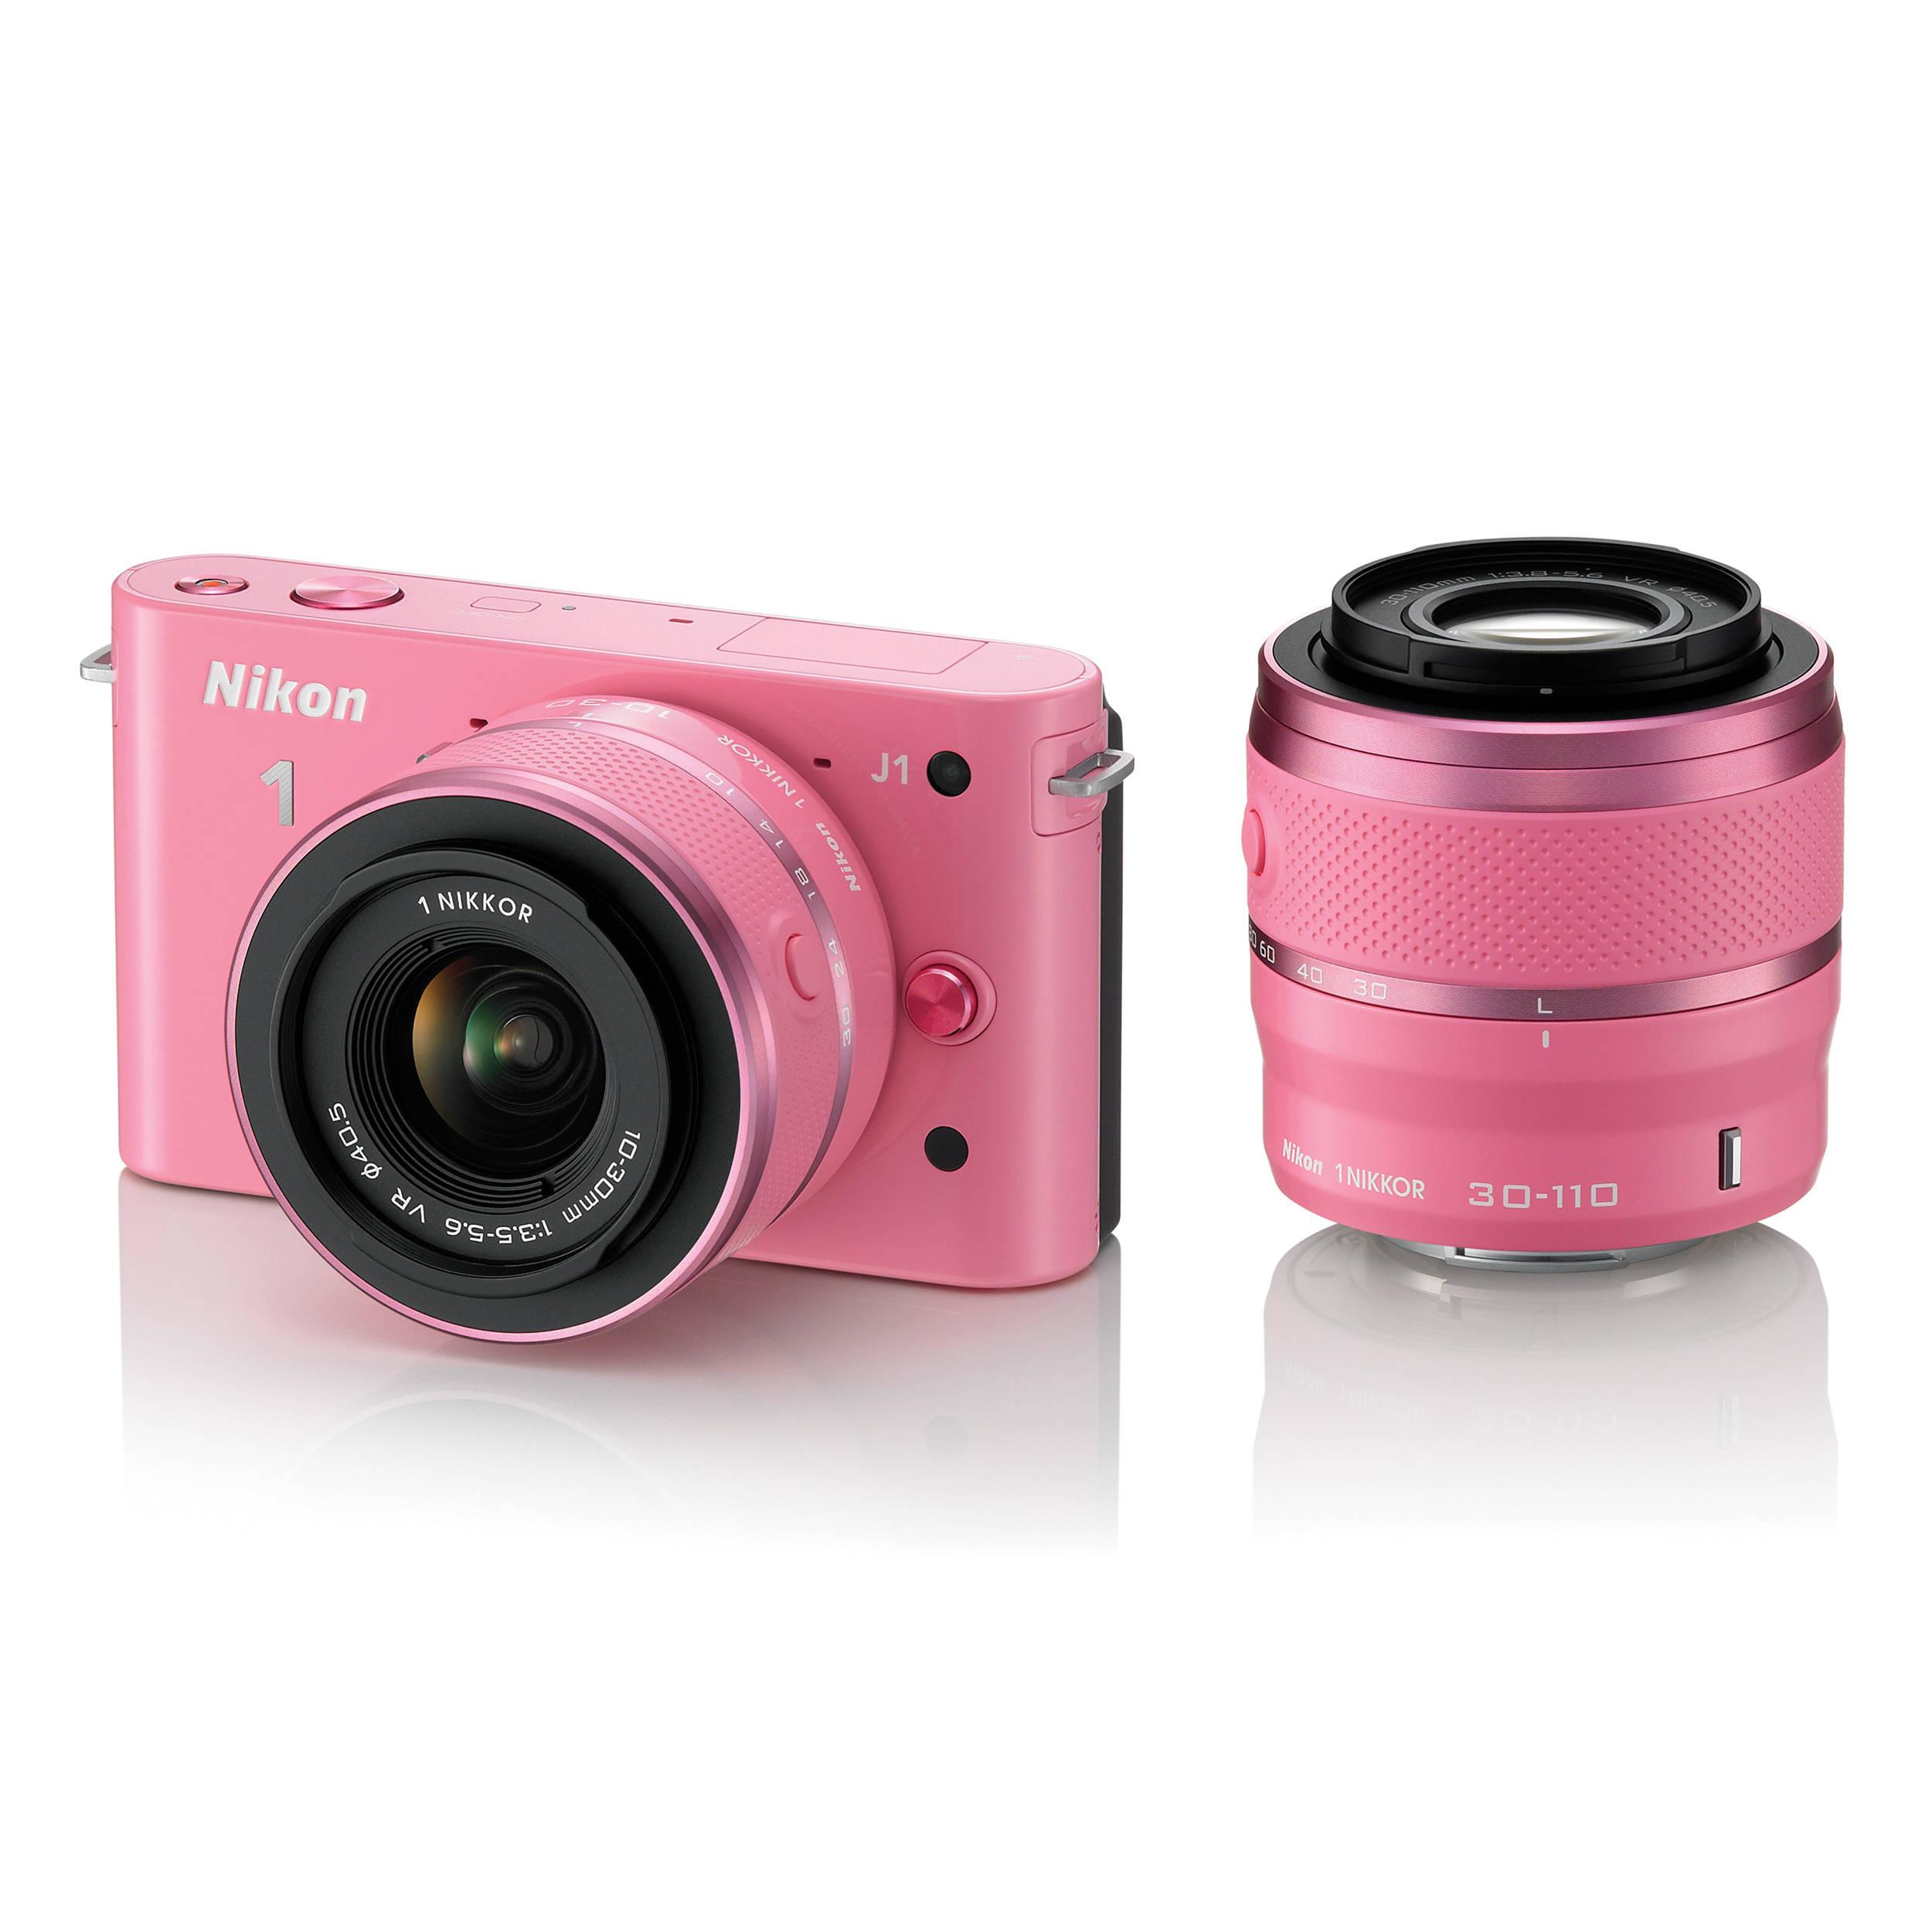 Nikon 1 J1 Mirrorless Digital Camera with 10-30mm / 27549 B&H